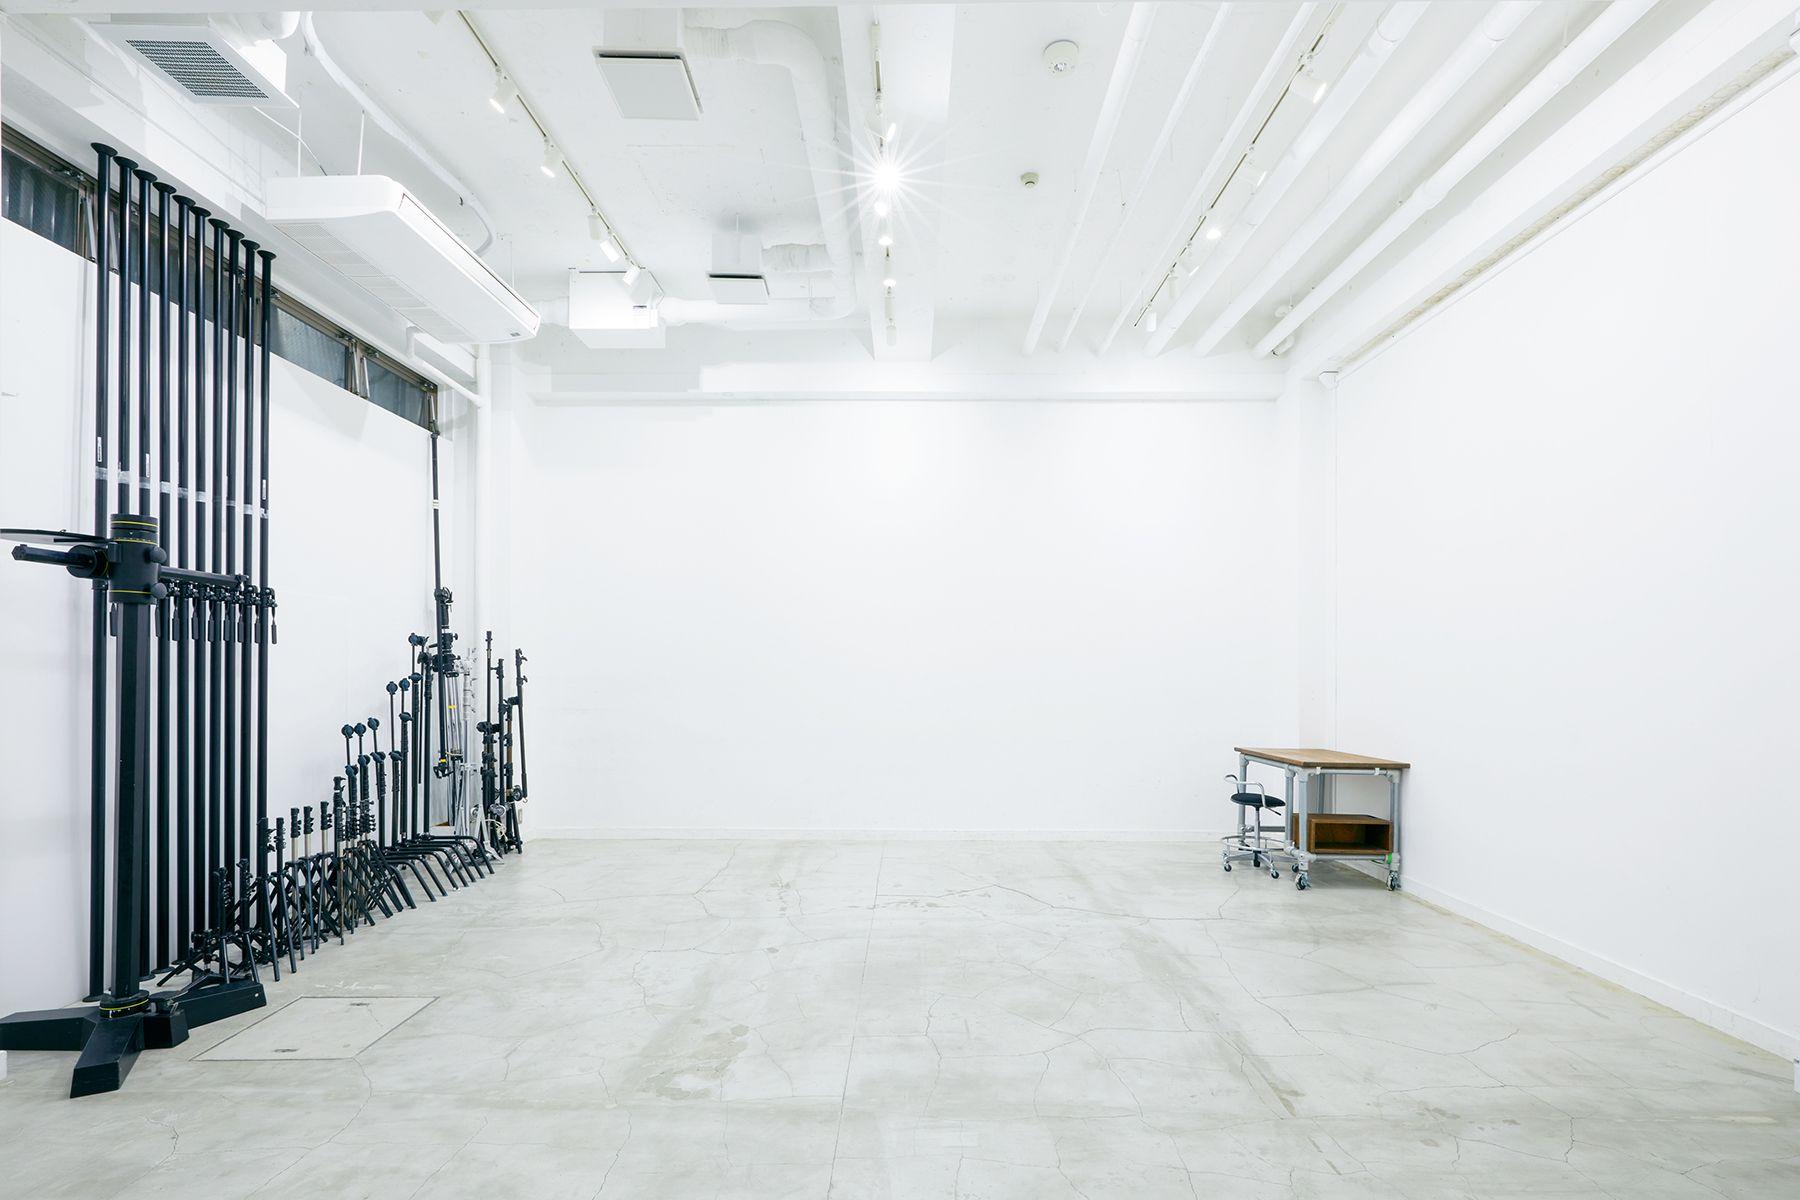 sinca studio 中野坂上 (シンカ スタジオ)モニター設置可能な机・椅子完備